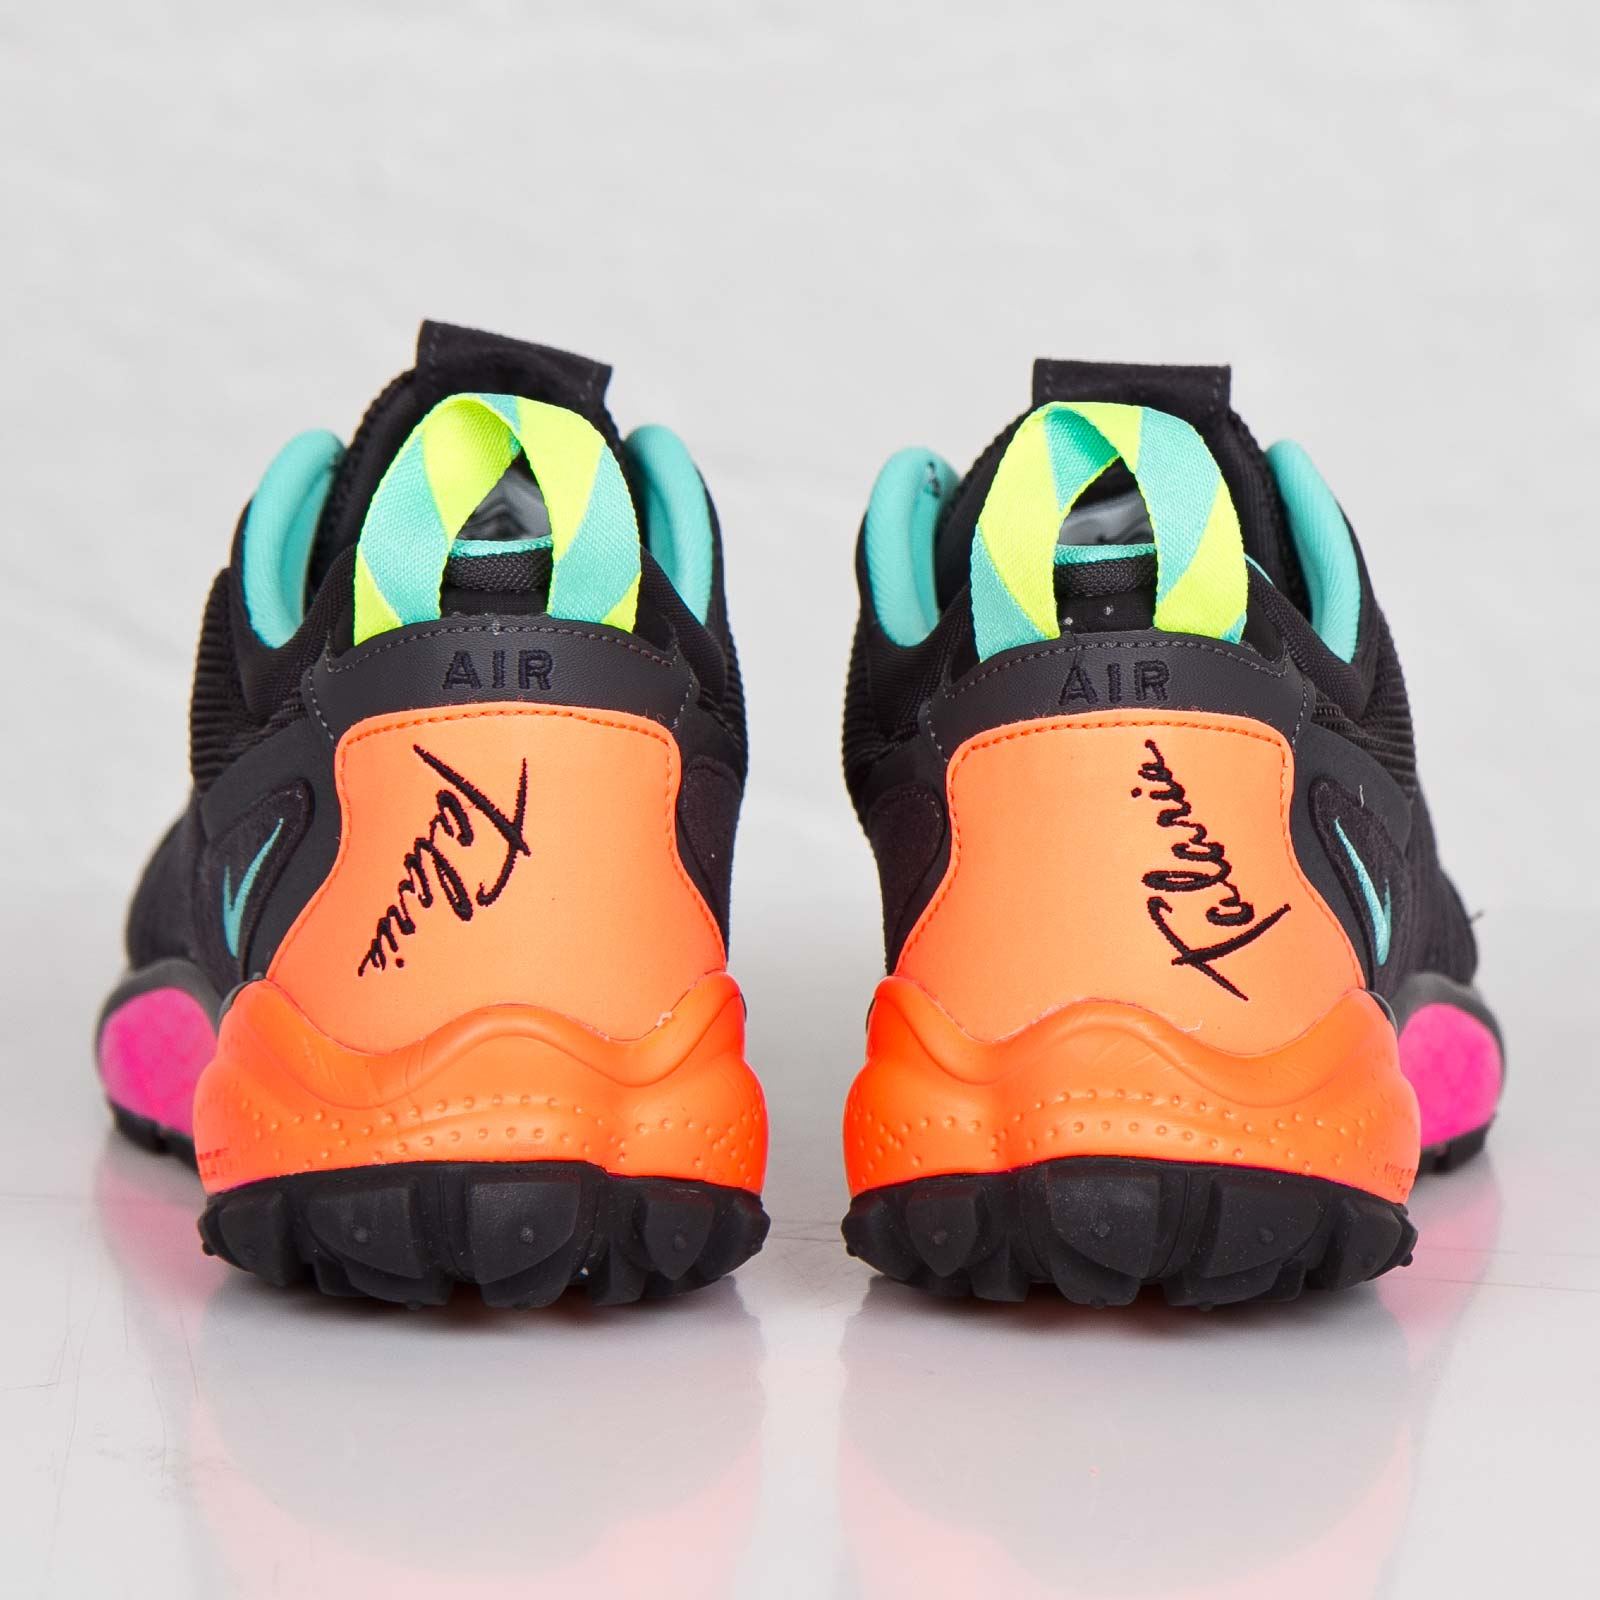 a3110c335974 sneakersnstuff x nike zoom talaria 2014